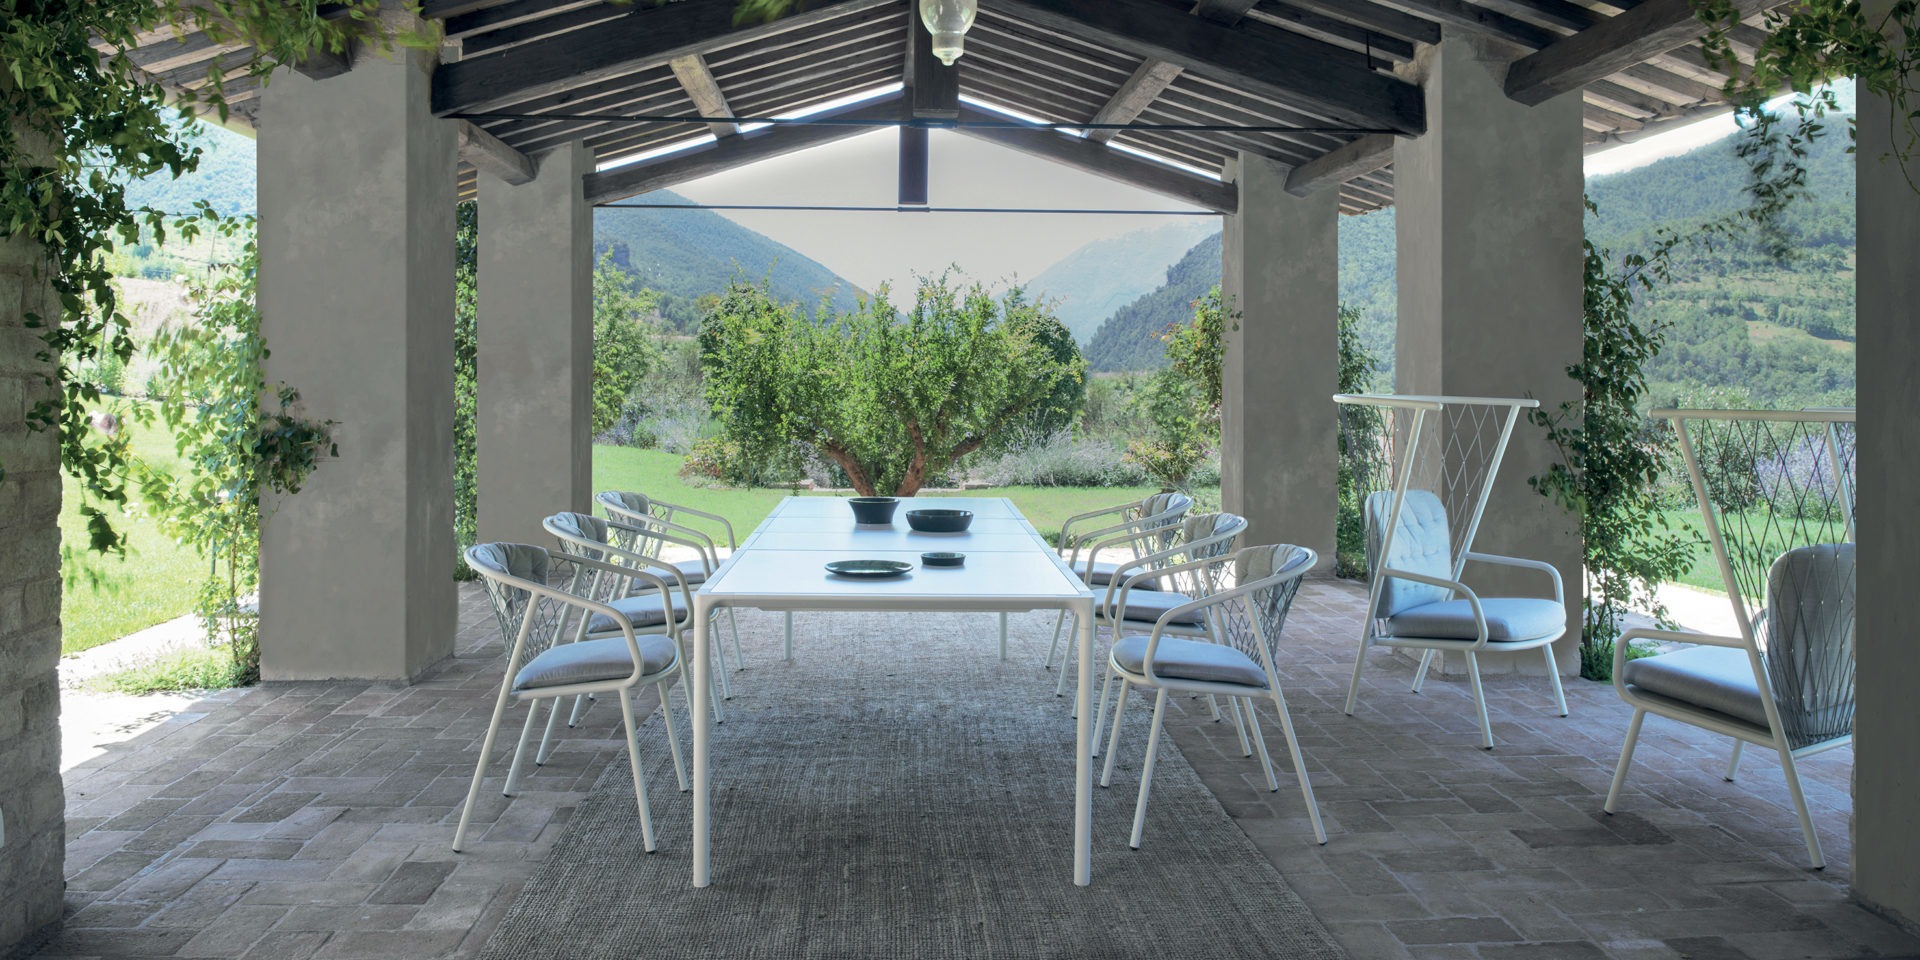 02_Nef_Terramare_EMU table jardin bordeaux arcachon cap ferret buxus